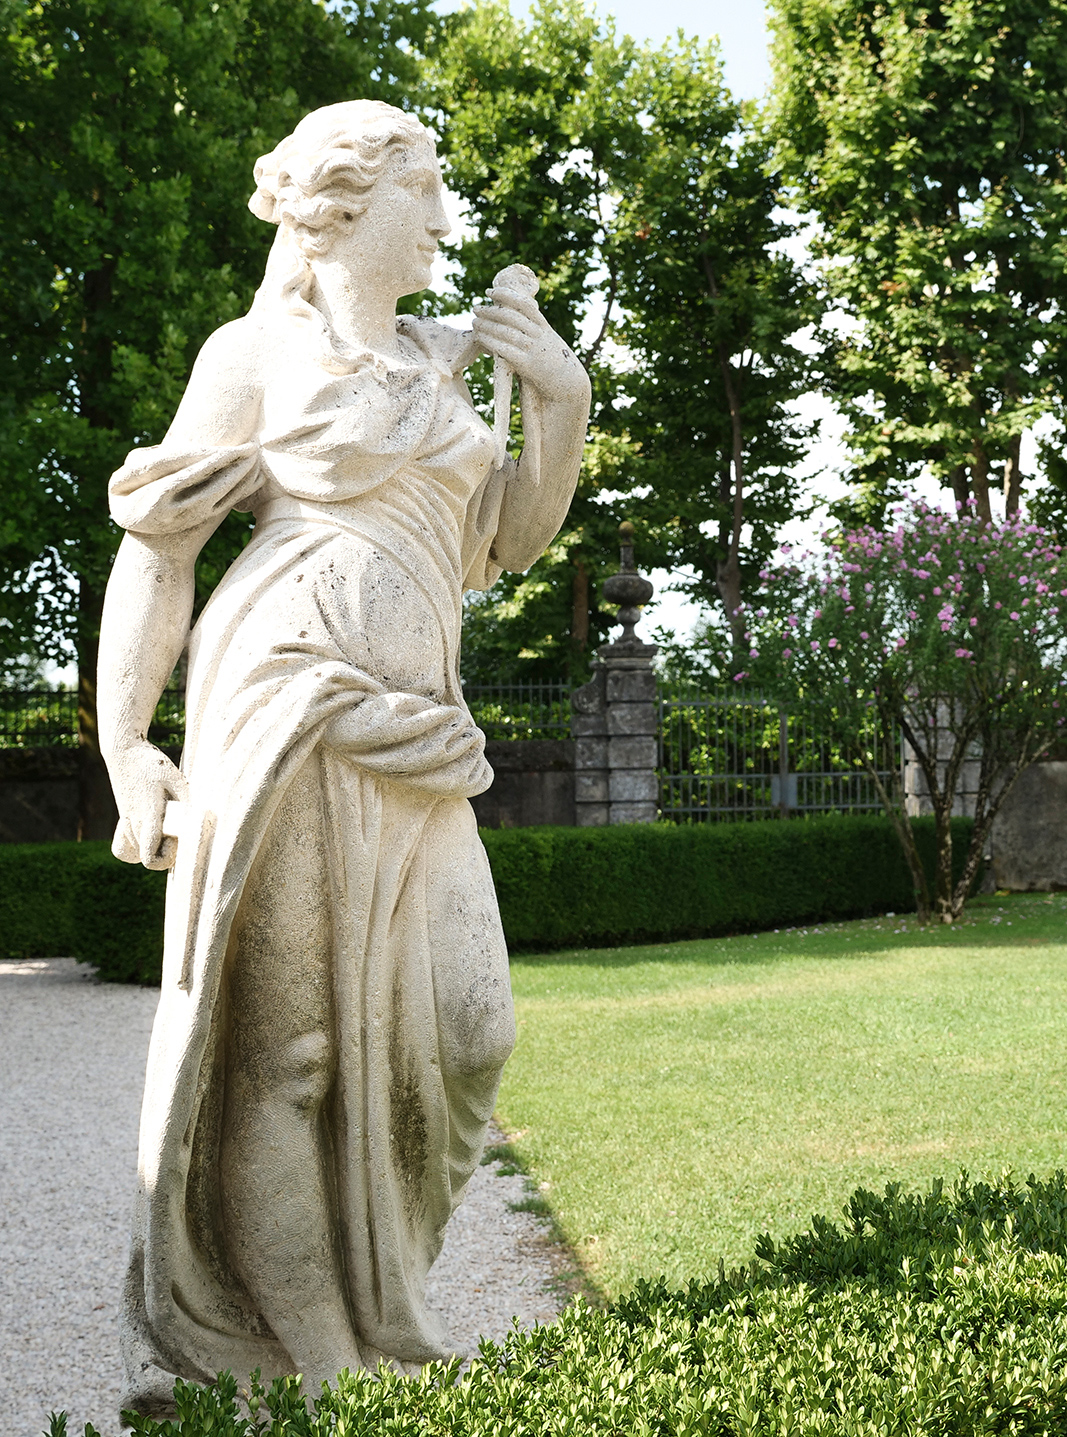 giardino esterno matrimoni Vicenza, giardino esterno matrimoni Padova, sala ricevimento, giardino esterno evento business